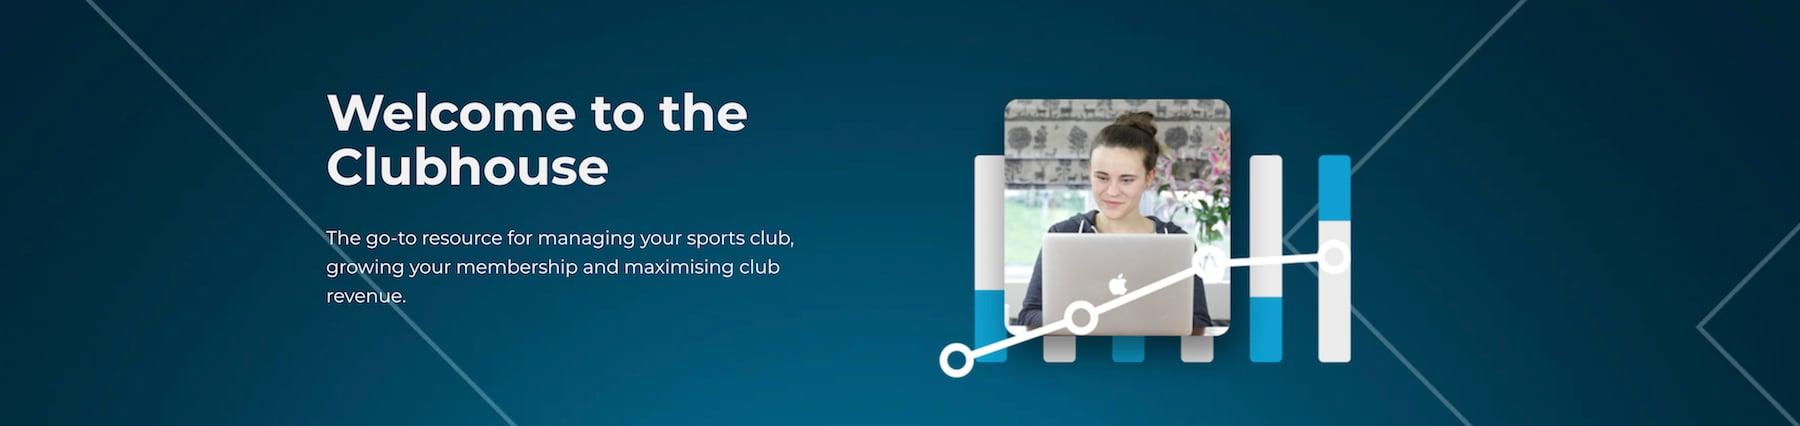 blog-pitchero-clubhouse